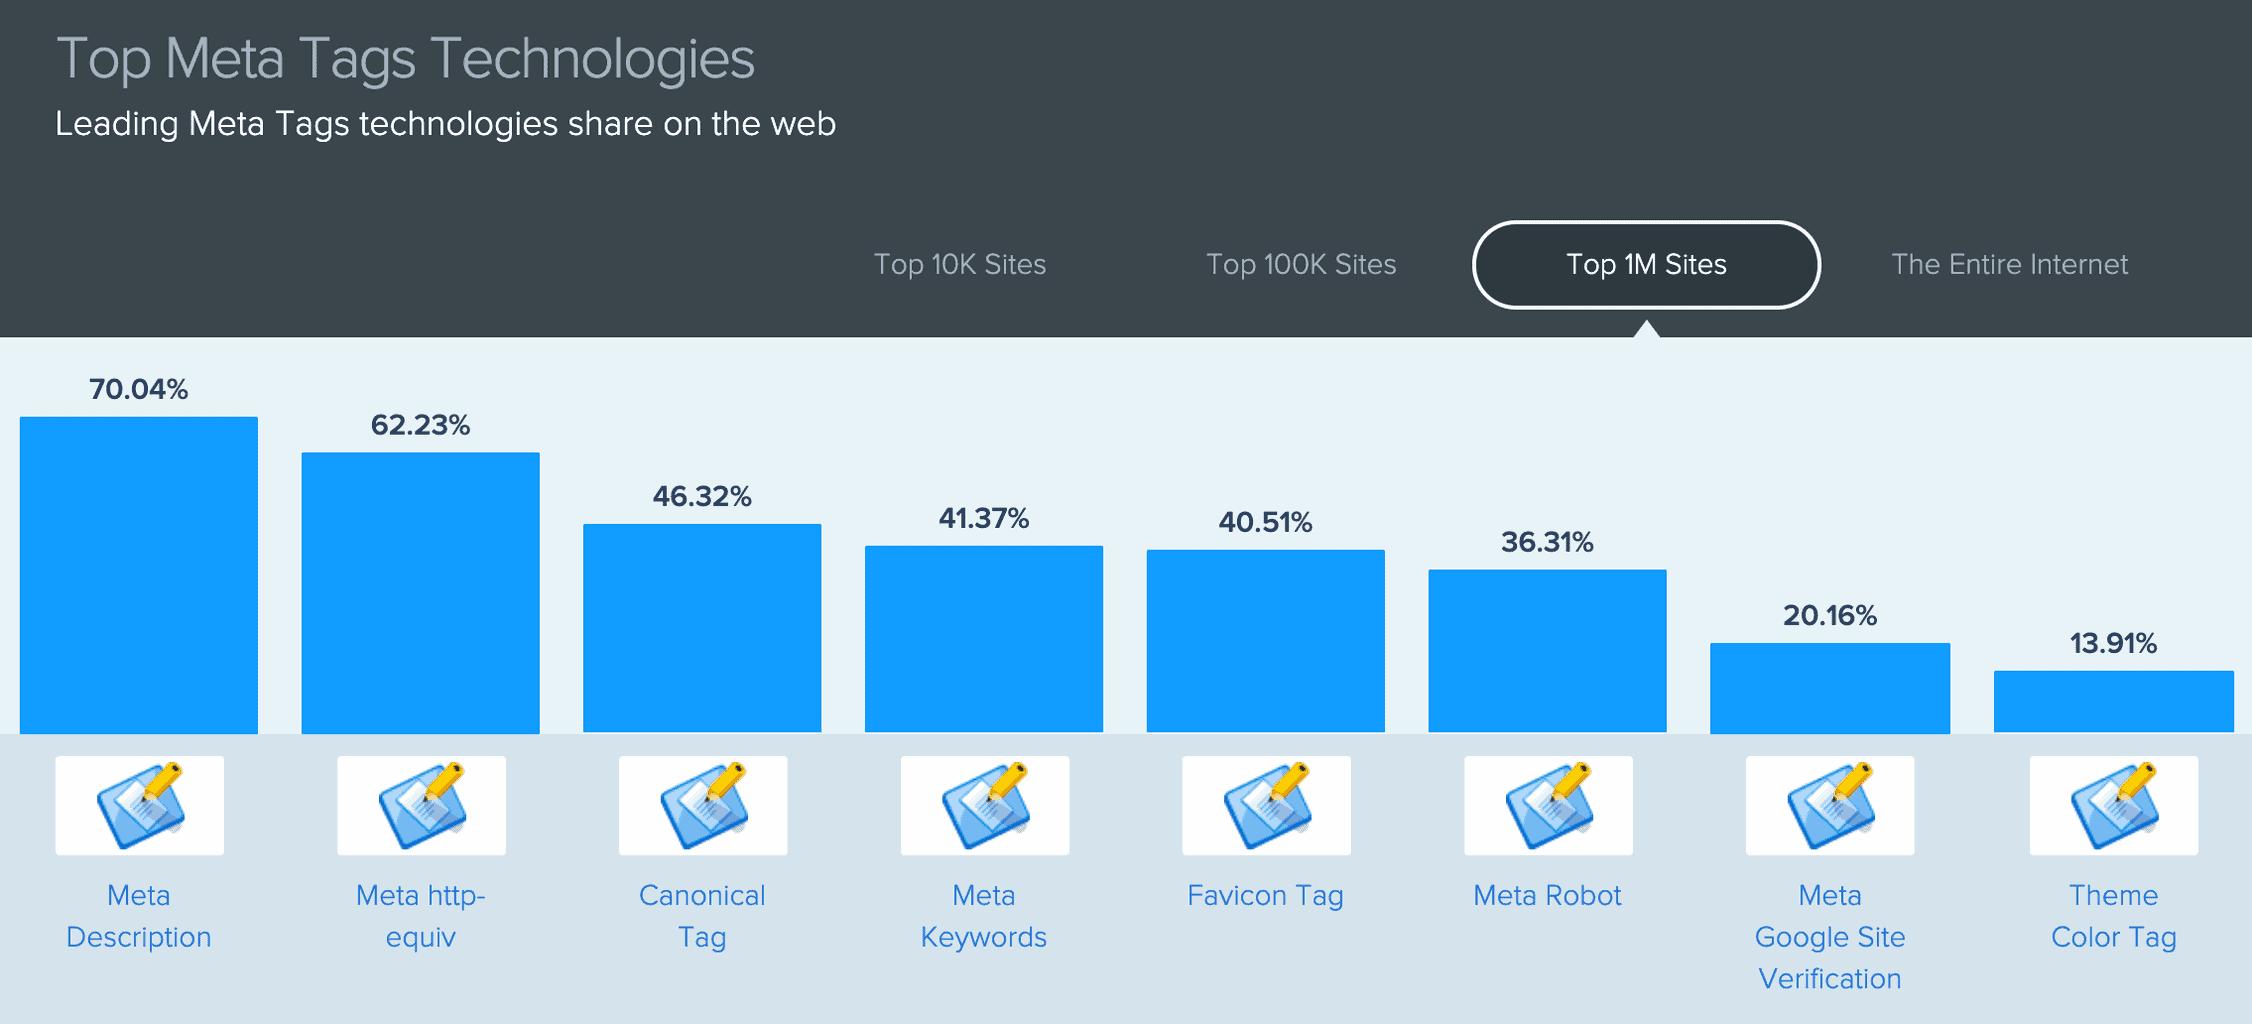 HTML 에서 어떤 메타 태그들이 주로 많이 사용되고 있는지에 대한 통계